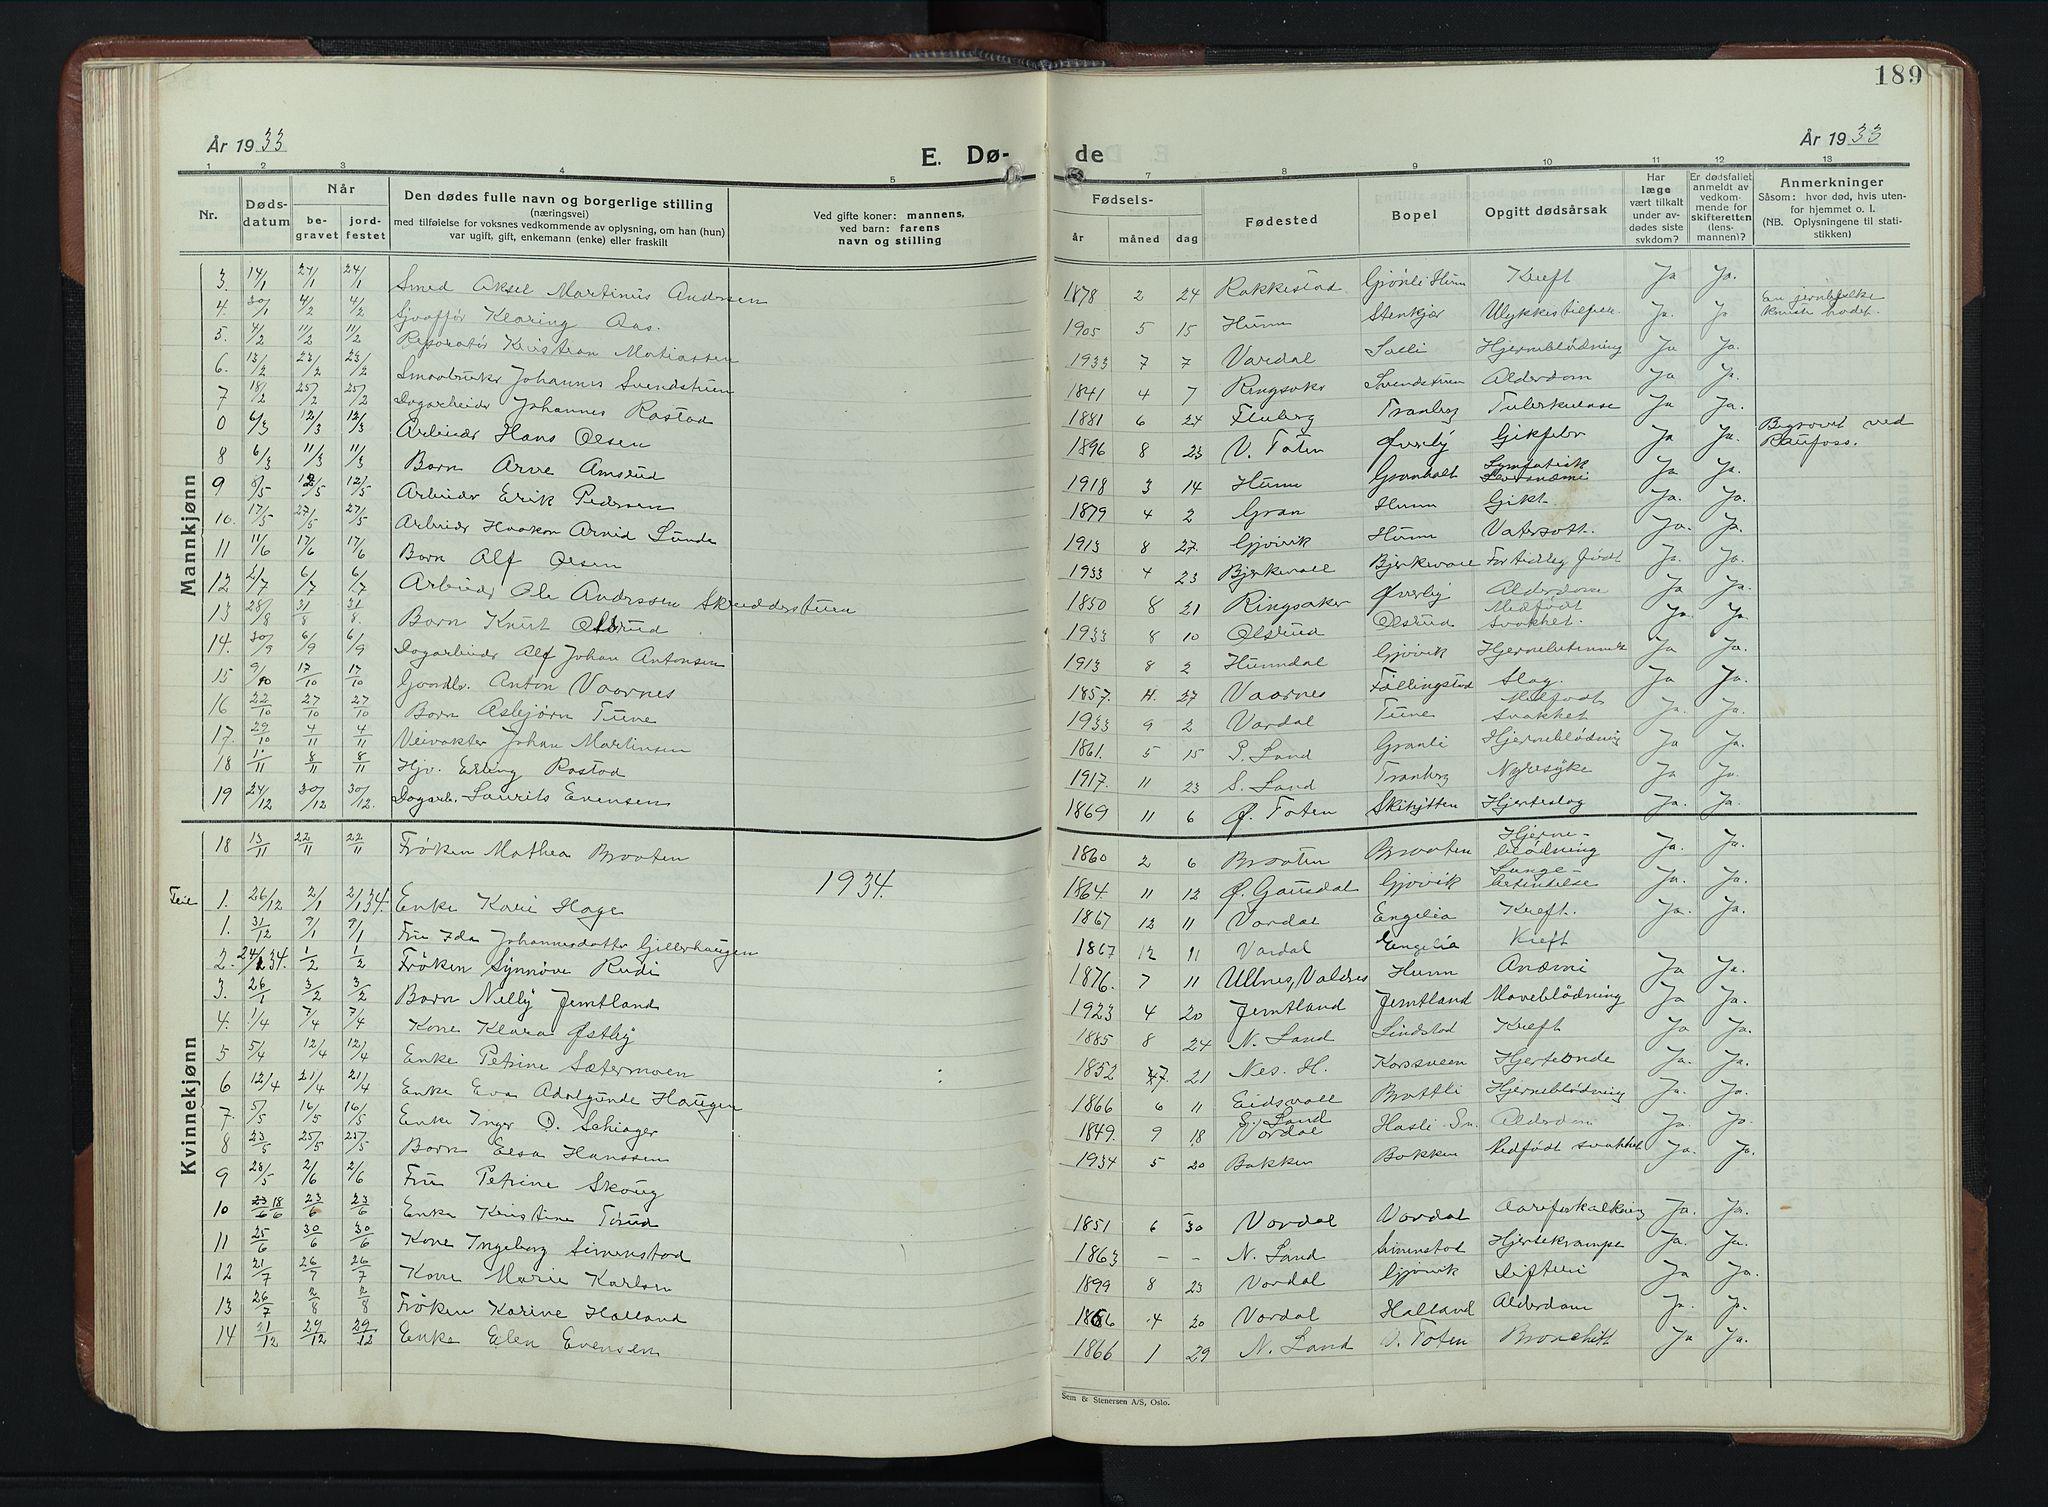 SAH, Vardal prestekontor, H/Ha/Hab/L0023: Klokkerbok nr. 23, 1929-1941, s. 189